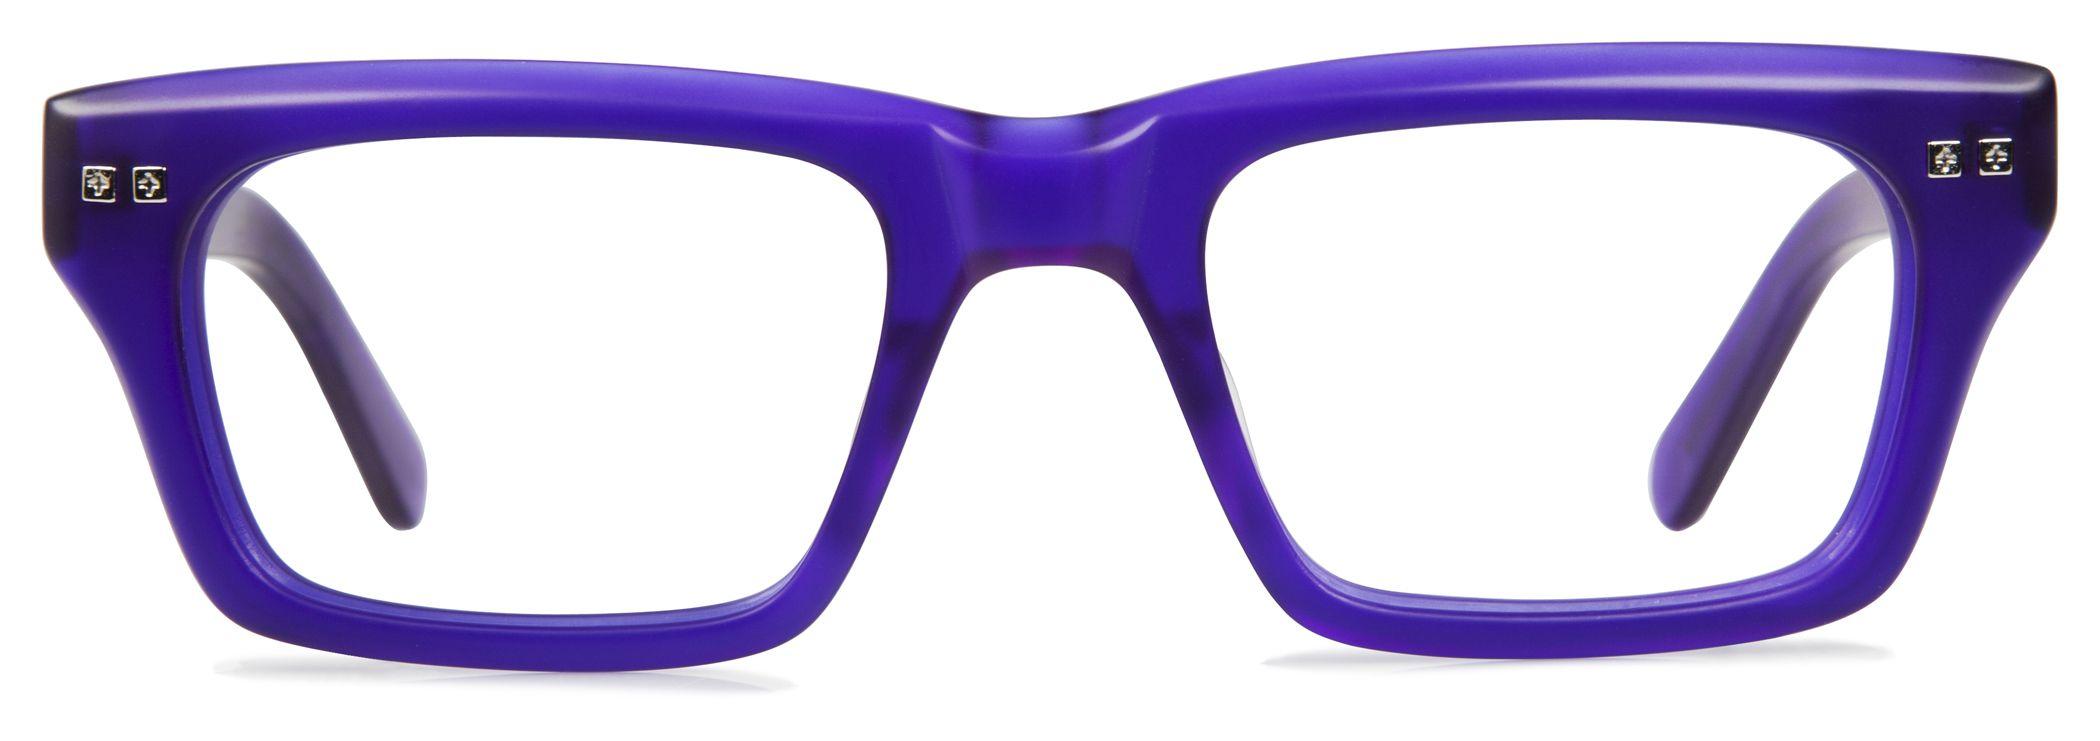 5ccc8a91c8 No.16 Glasses - Designer Frames For Women